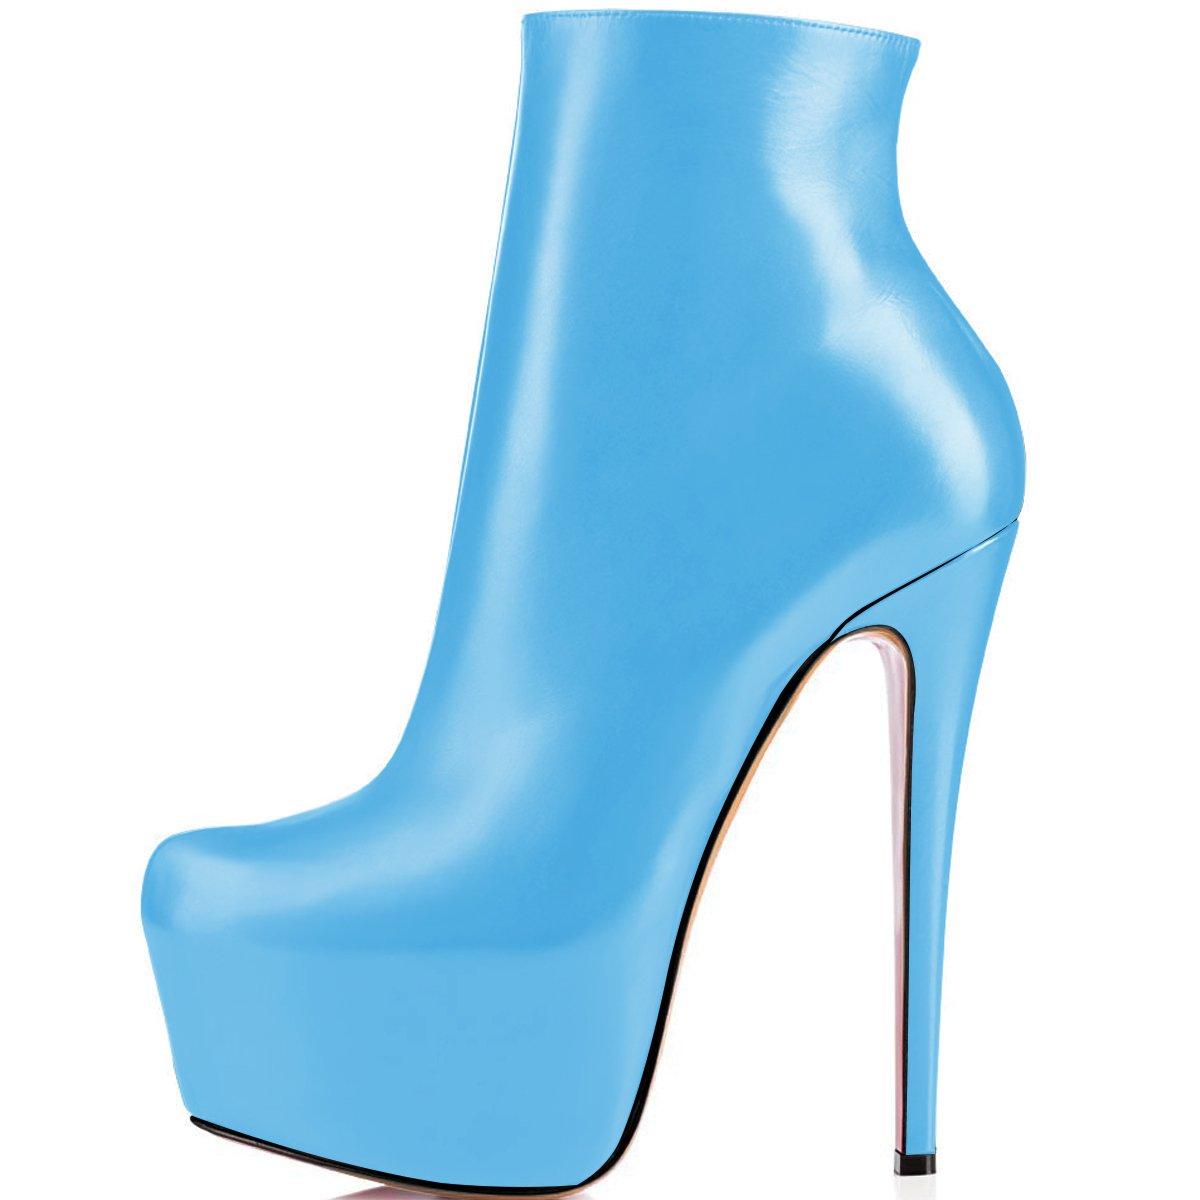 ELASHE Ankle Boots | 15cmTrendige Damen Stiefeletten | Plateau Stiefel mit Absatz37 EU|Blau